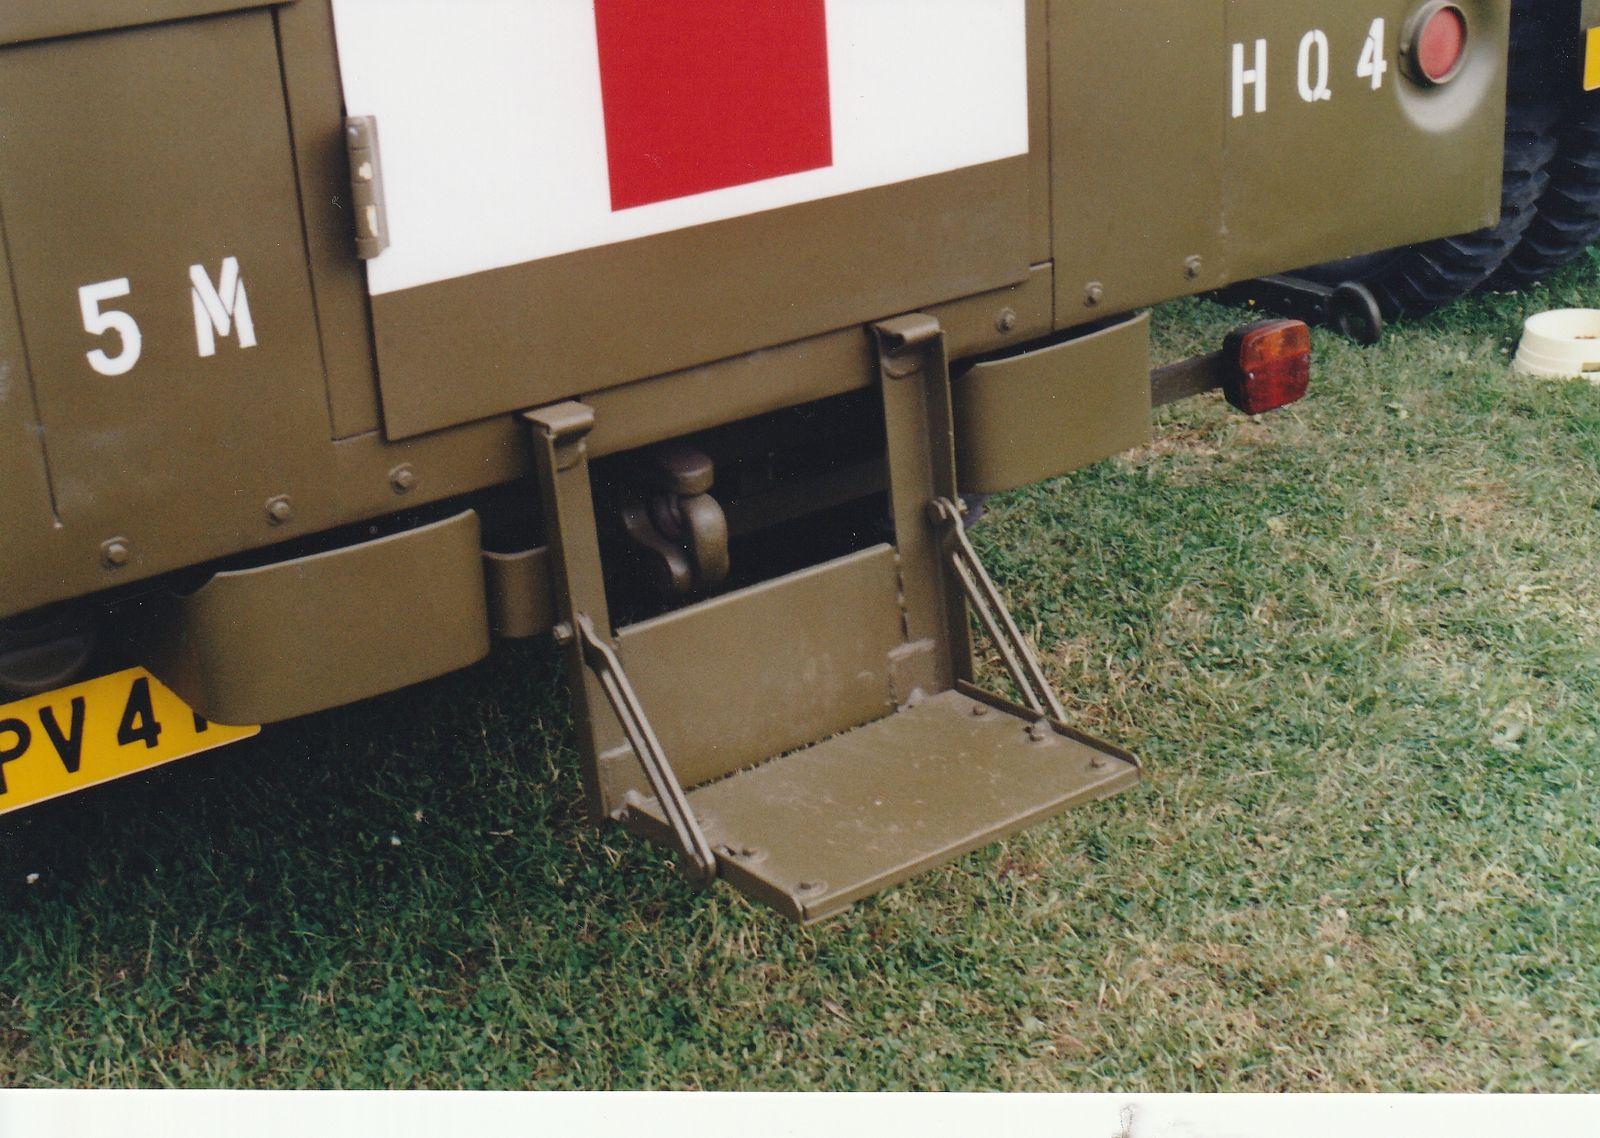 crédit photo : alain Chaussade : WC KD 64 mormandie 2004 Isigny sur mer